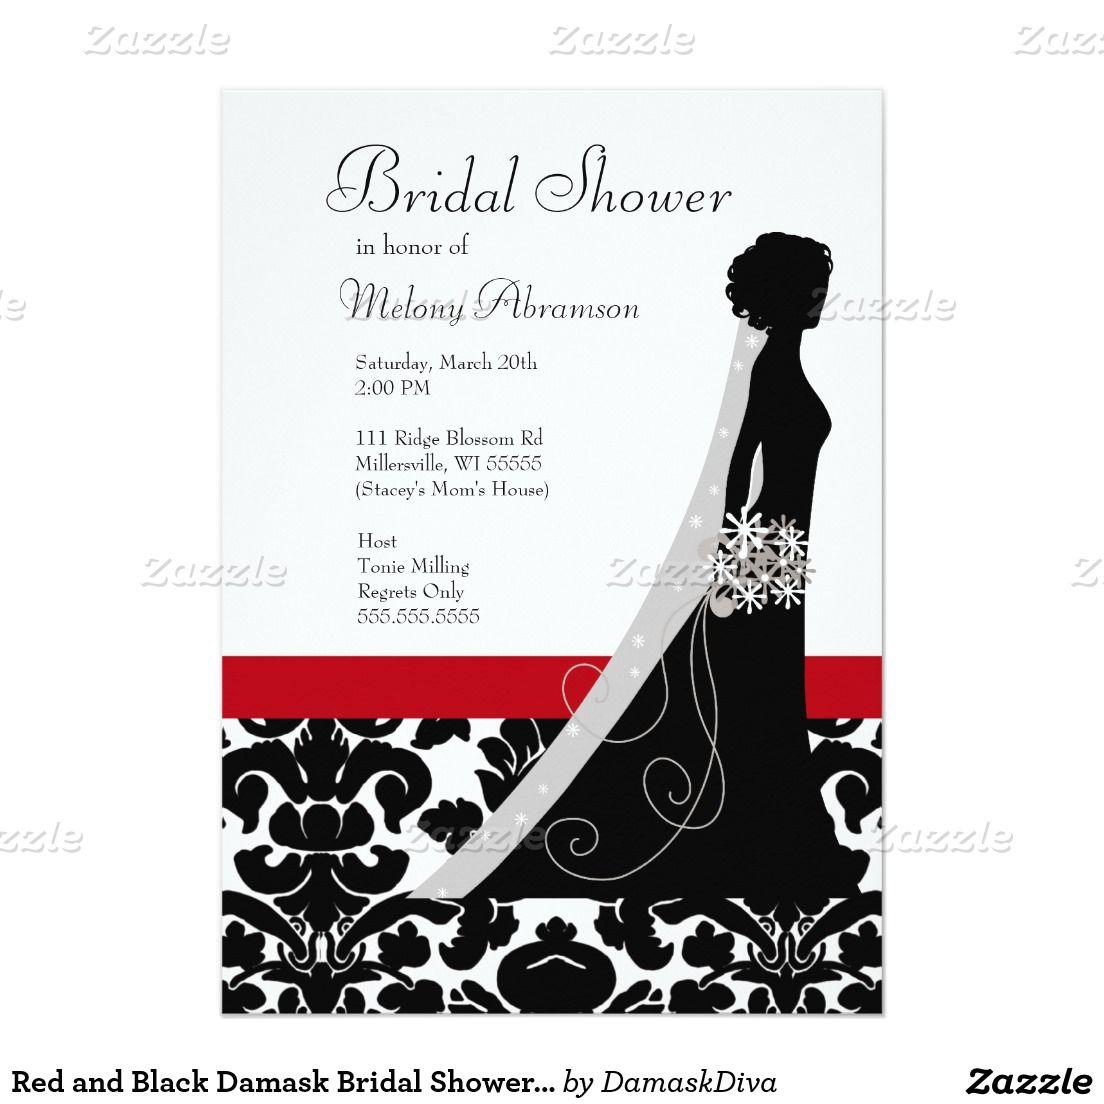 Red and Black Damask Bridal Shower Invitations | Bridal showers ...